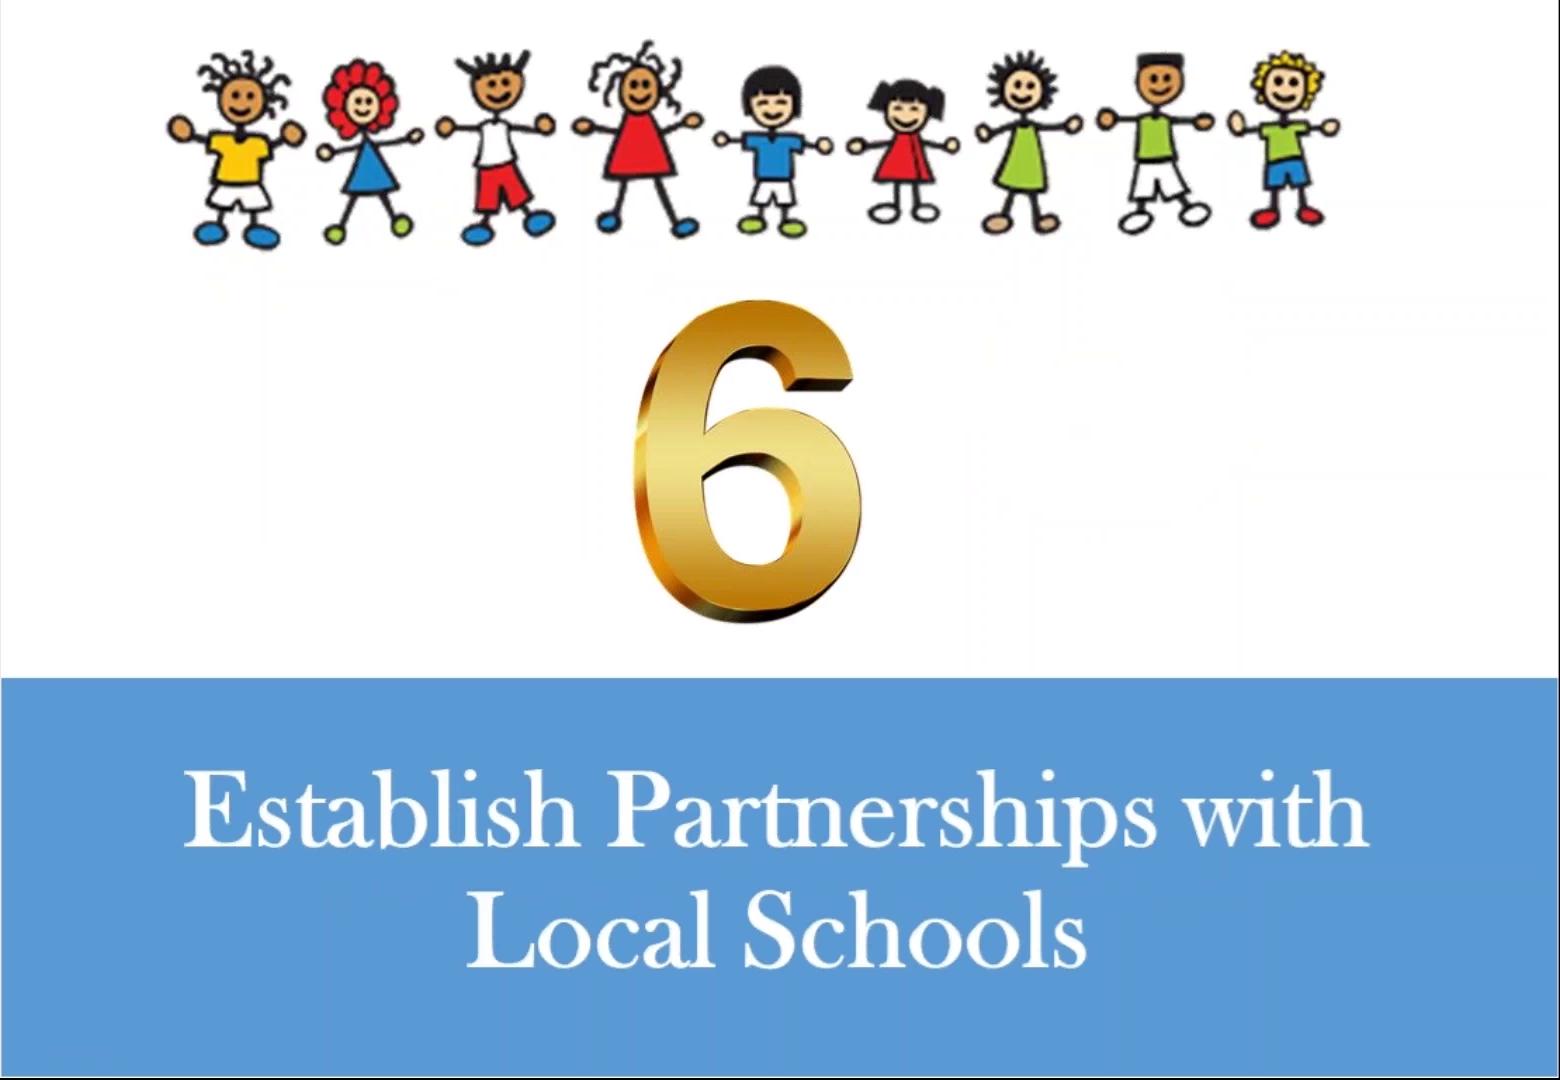 Establish Partnerships with Local Schools